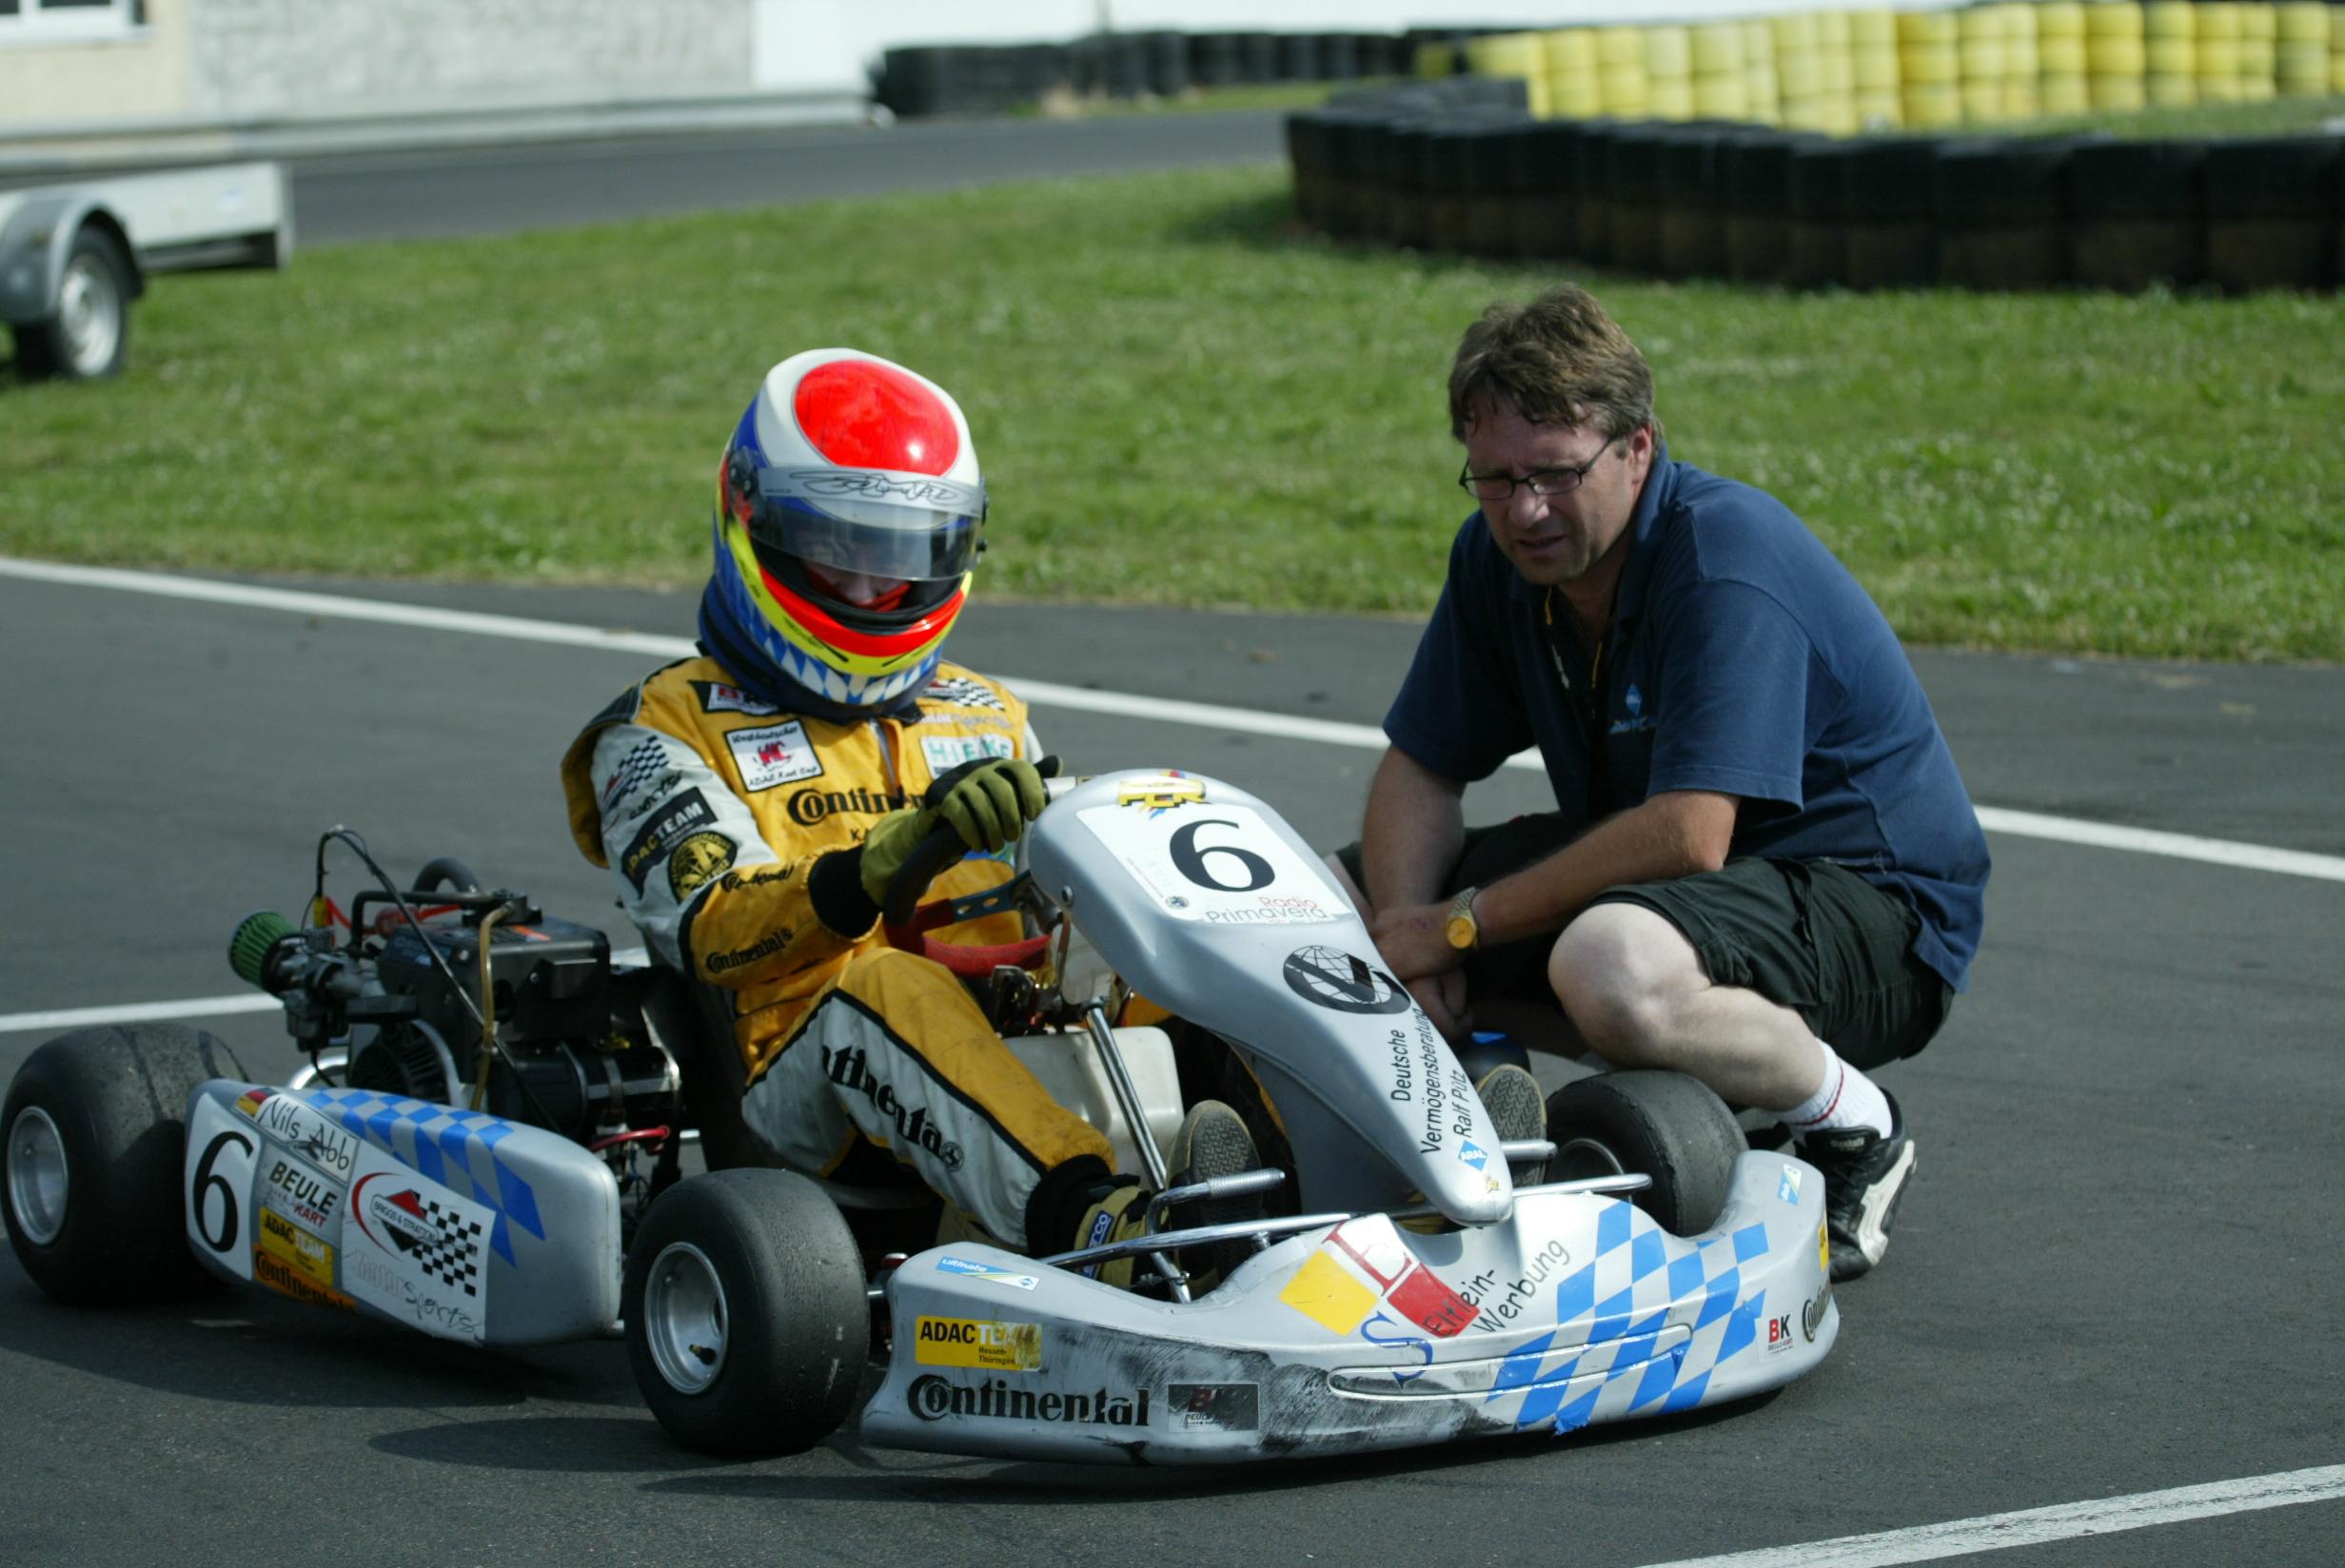 Oppenrod 2006 - Nils und Jürgen Abb